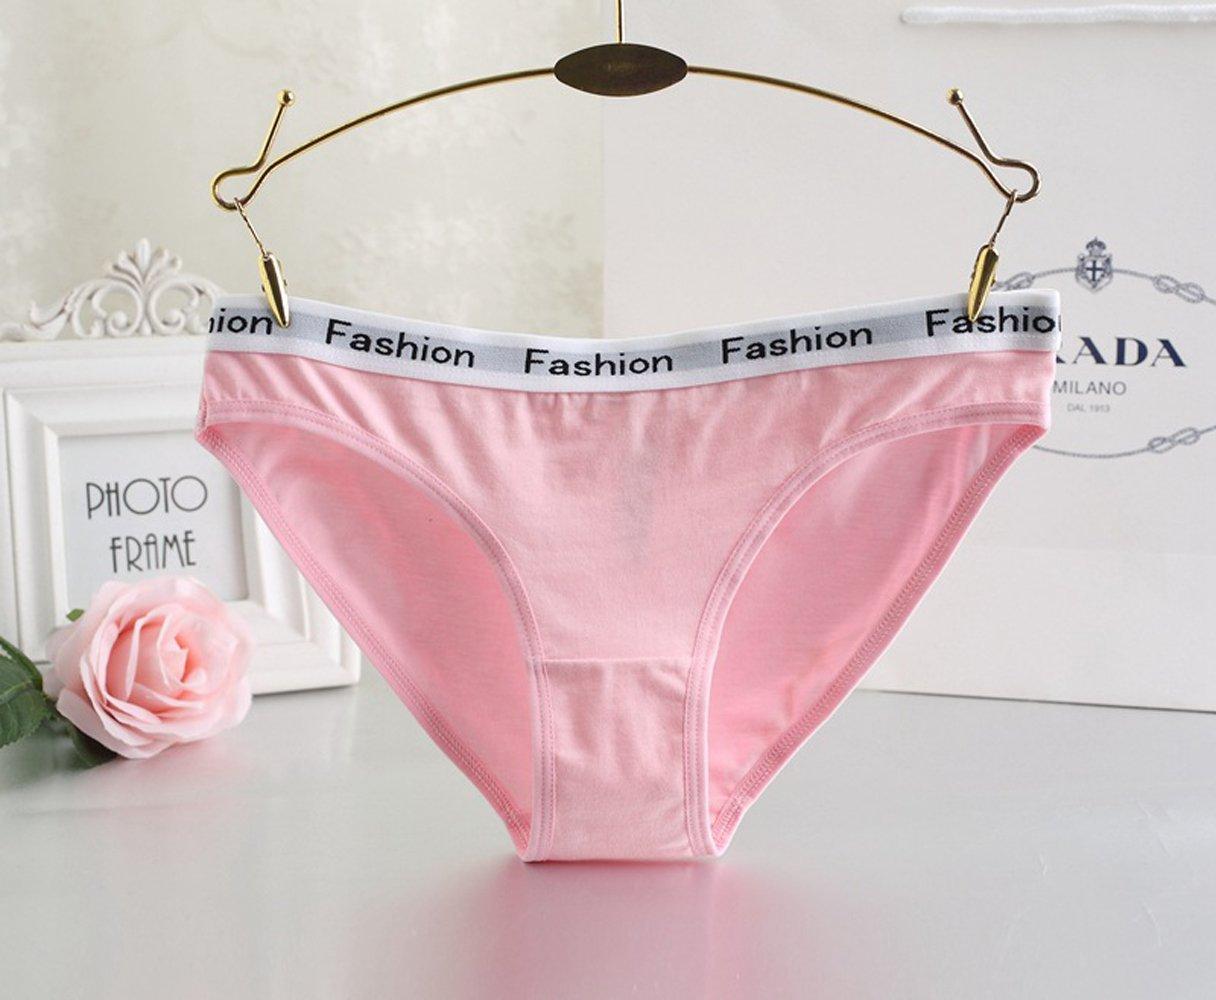 Zooma Frauen Unterwäsche Damen Pantys Hipster Panties aus Baumwolle , Rosa - 4er Pack, 3XL/EU48 Taille:44\'\'-48\'\'